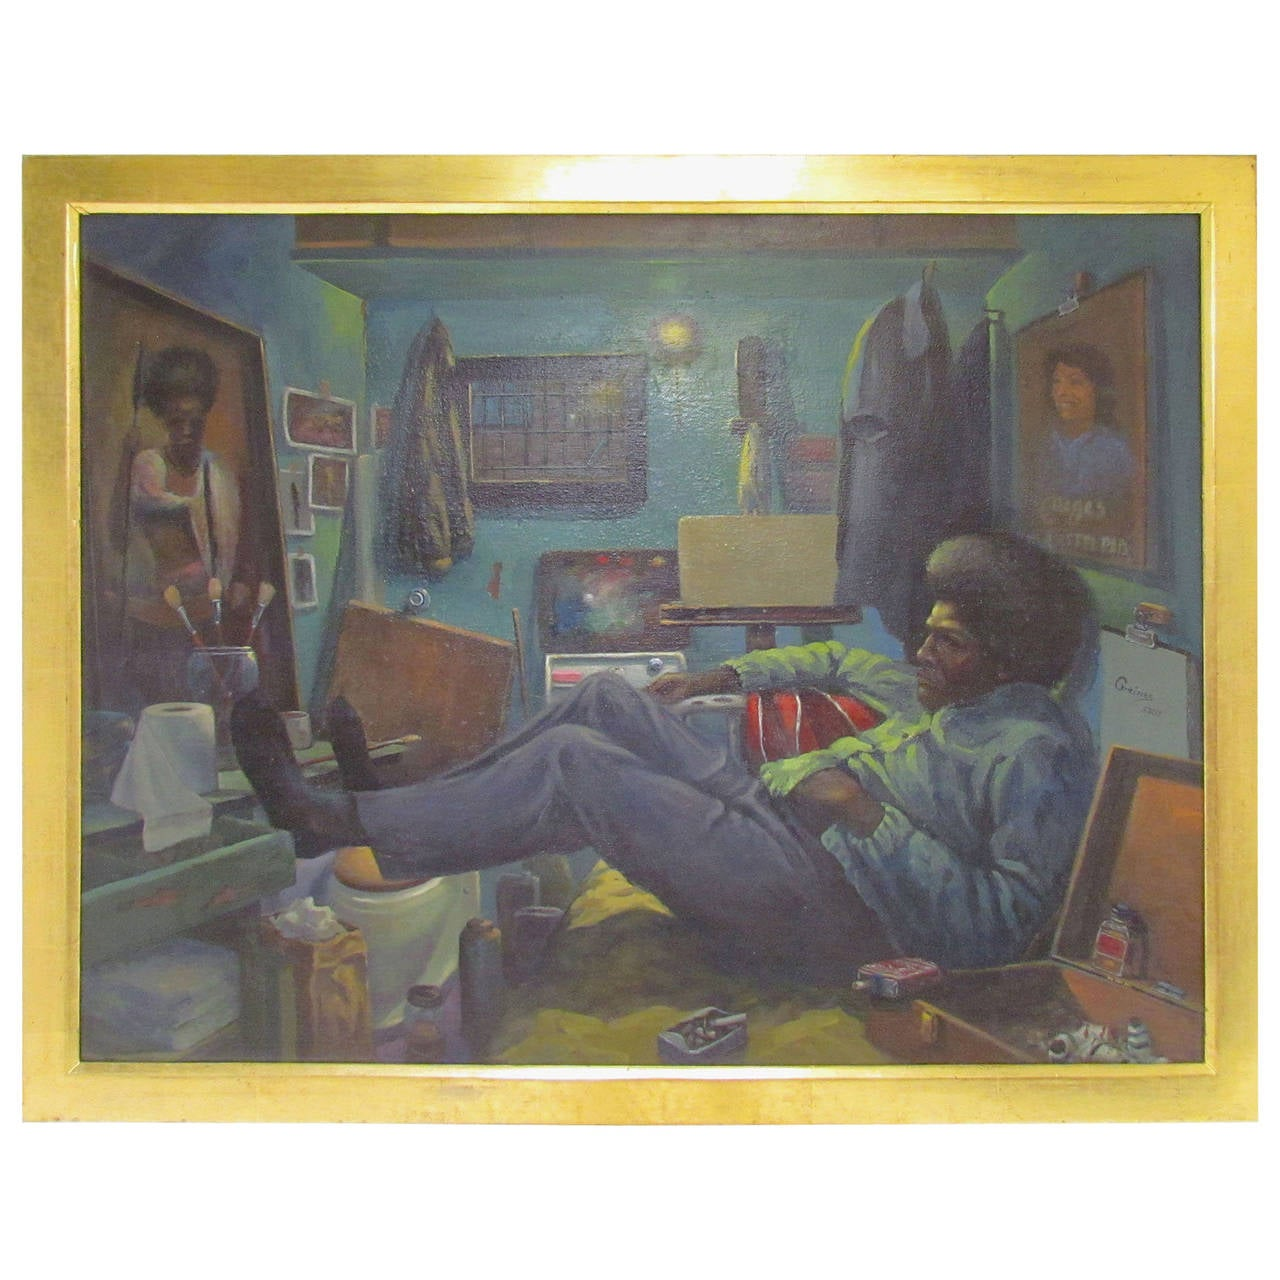 Exemplary Prison Art Self-Portrait Painting by Joel Gaines, circa 1970s